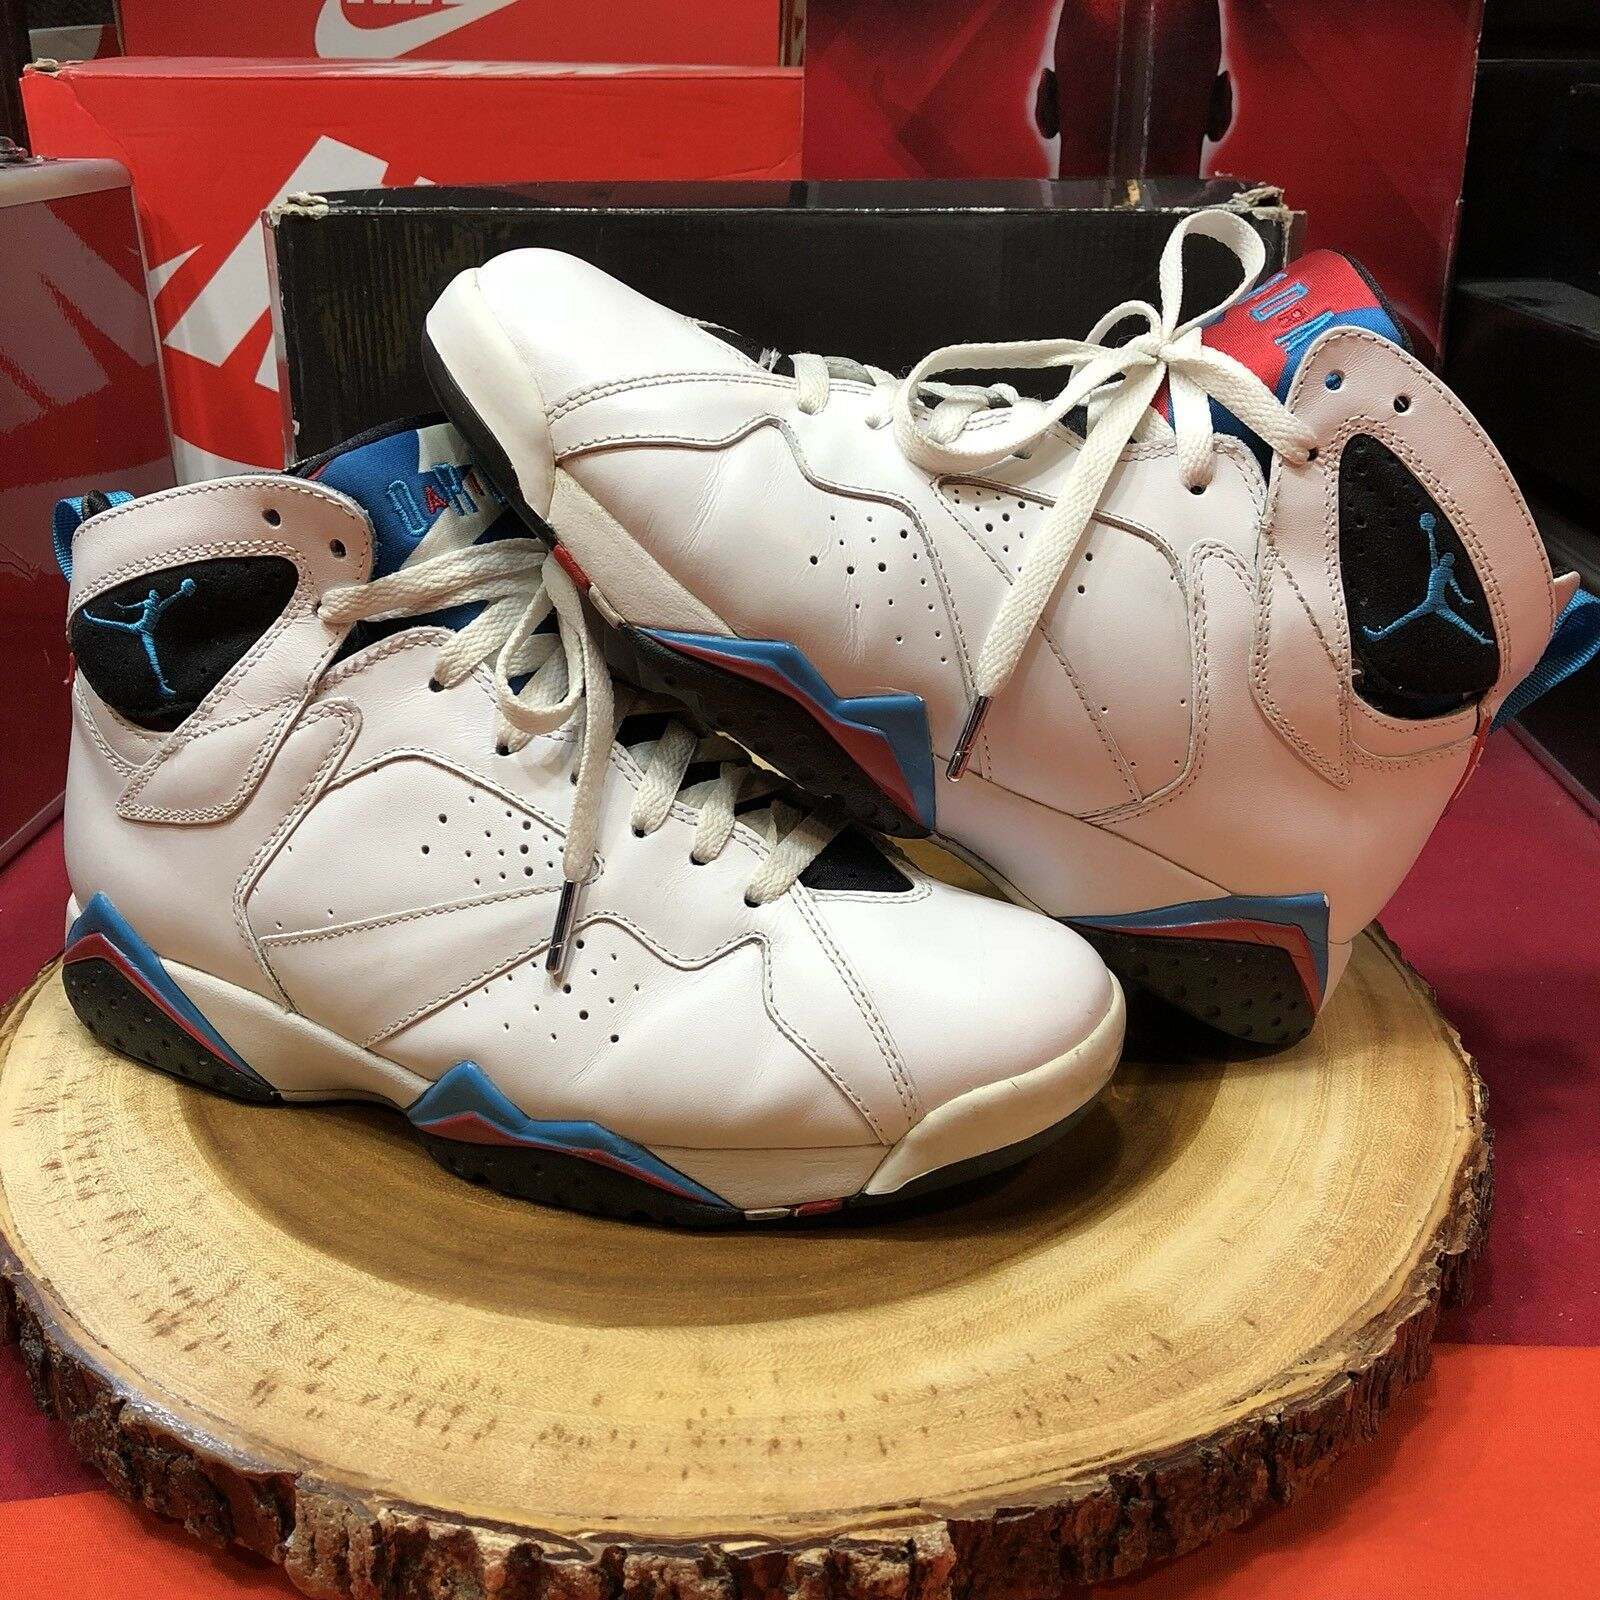 Nike air jordan vii 7 7 7 retro bianco / blu e nero infrarossi 304775-105 taglia 9 orion 3c9b8a